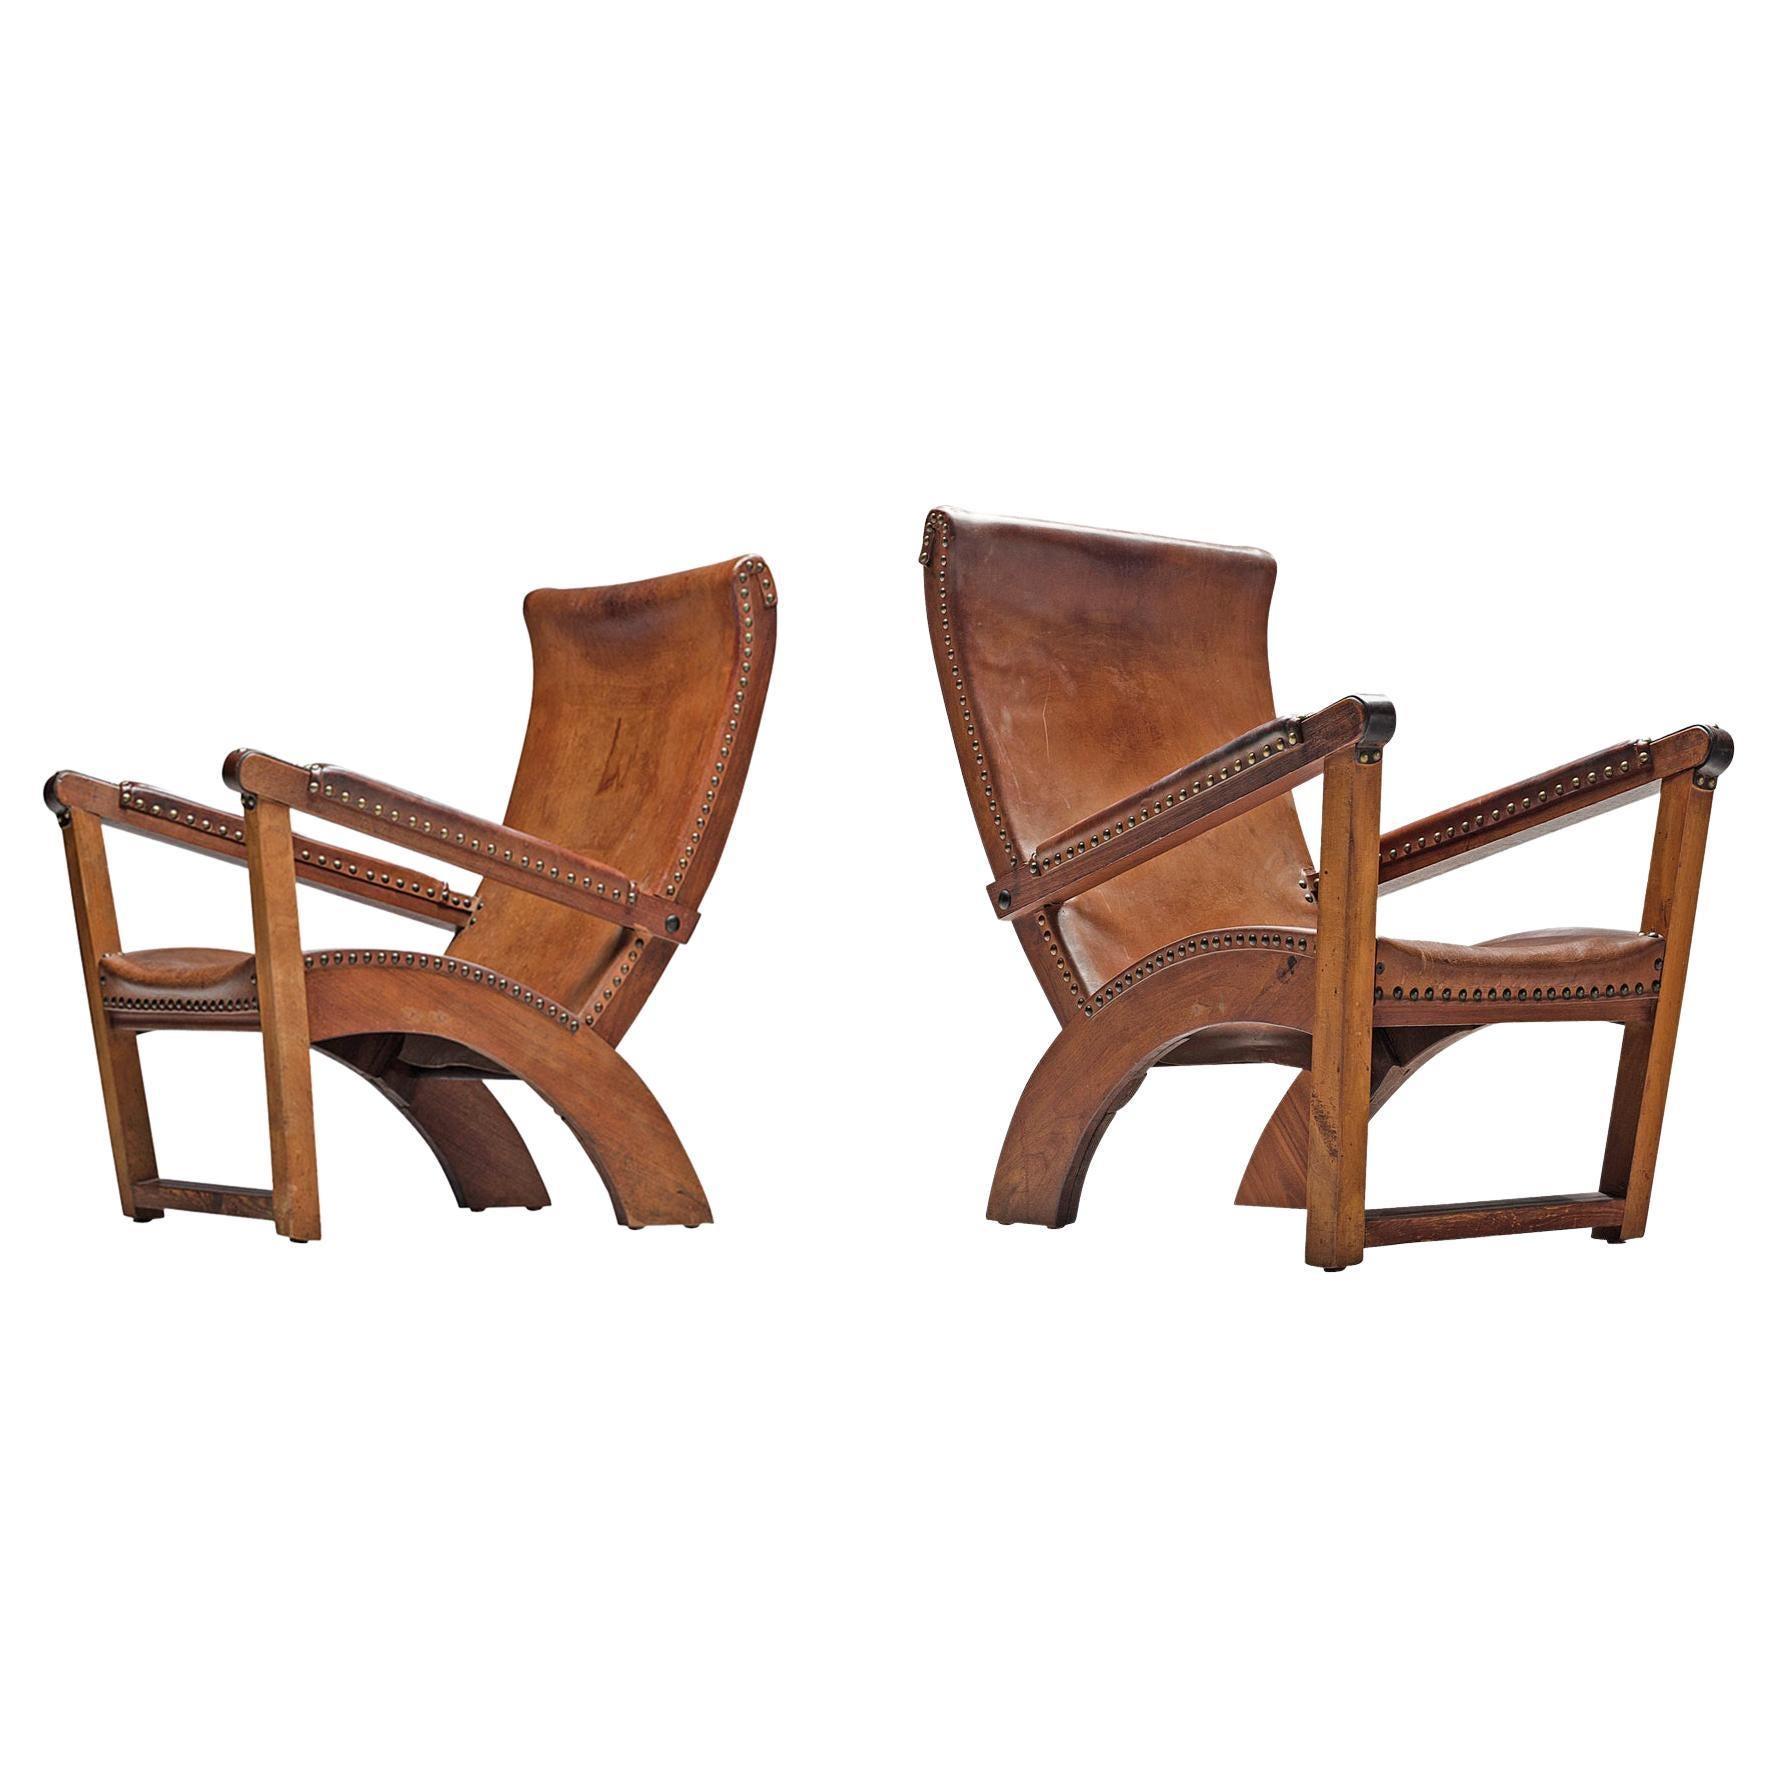 Mogens Voltelen 'Copenhagen' Lounge Chair in Leather